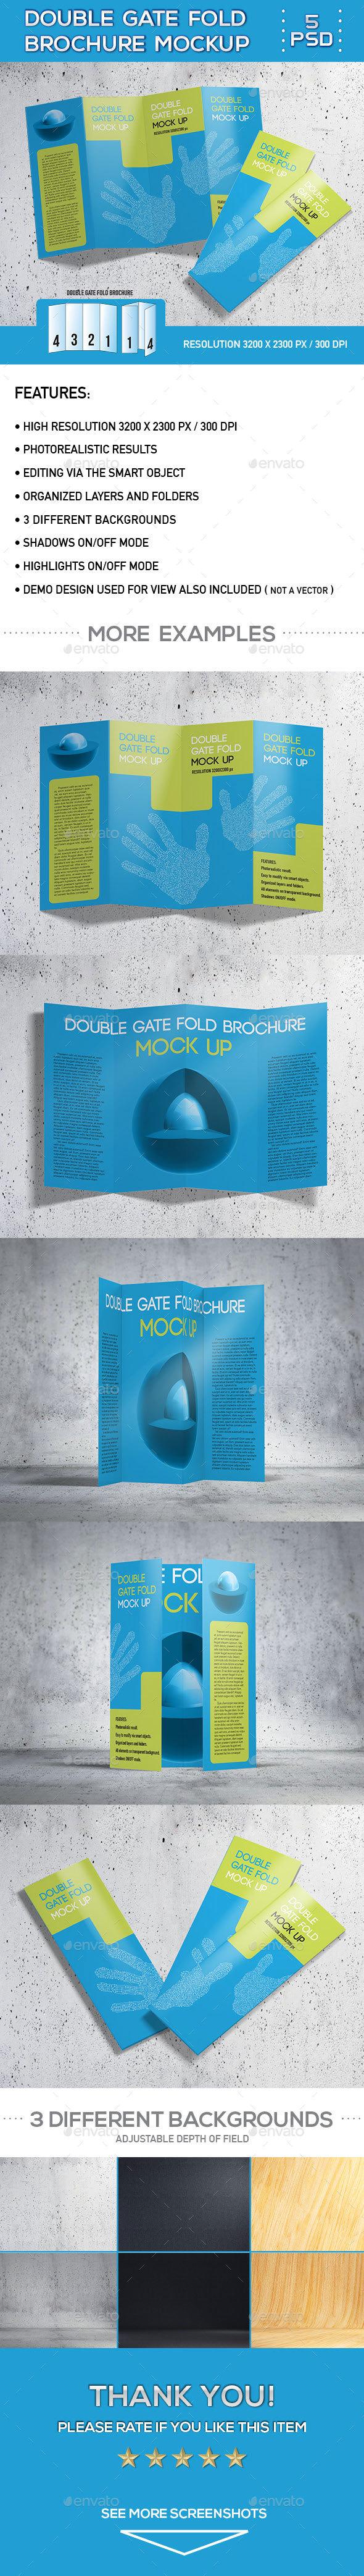 Double Gate Fold Brochure Mock-Up - Brochures Print